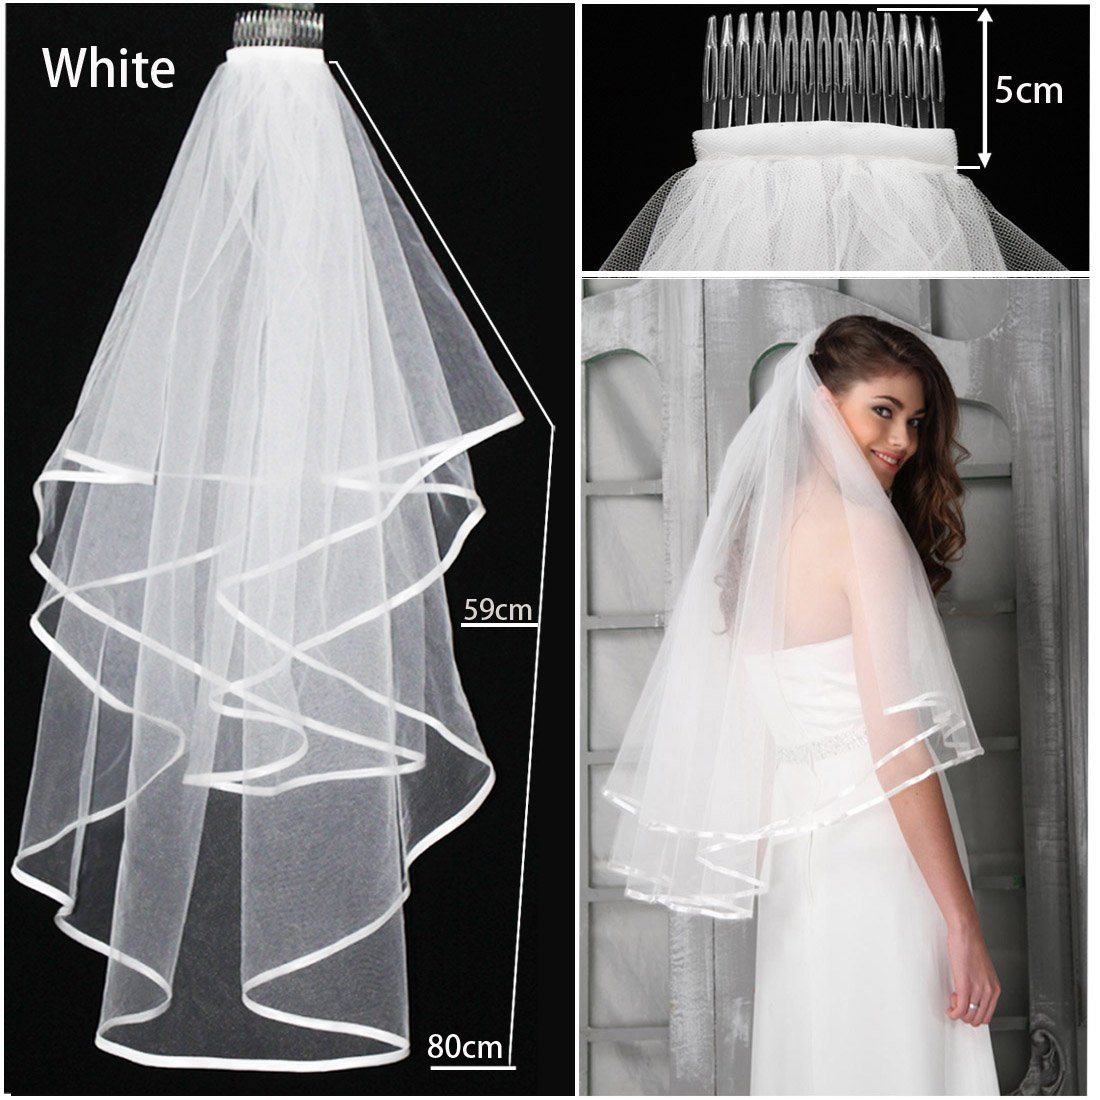 Ivory White Veil Wedding Bride Bachelorette To Be Fancy Dress Hen Night Party